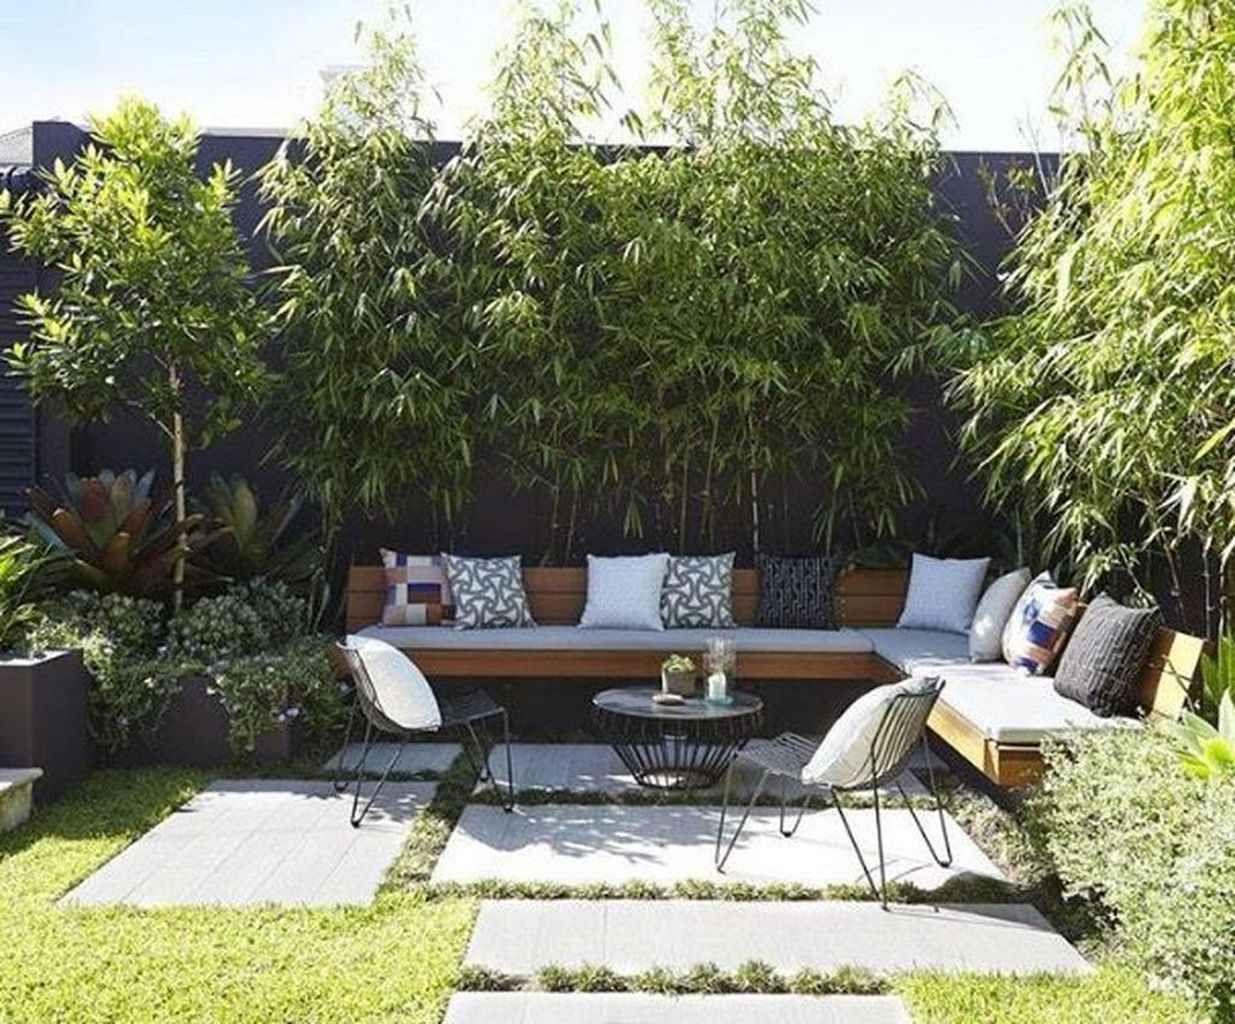 95 Small Courtyard Garden With Seating Area Design Ideas ... pour Deco Design Jardin Terrasse